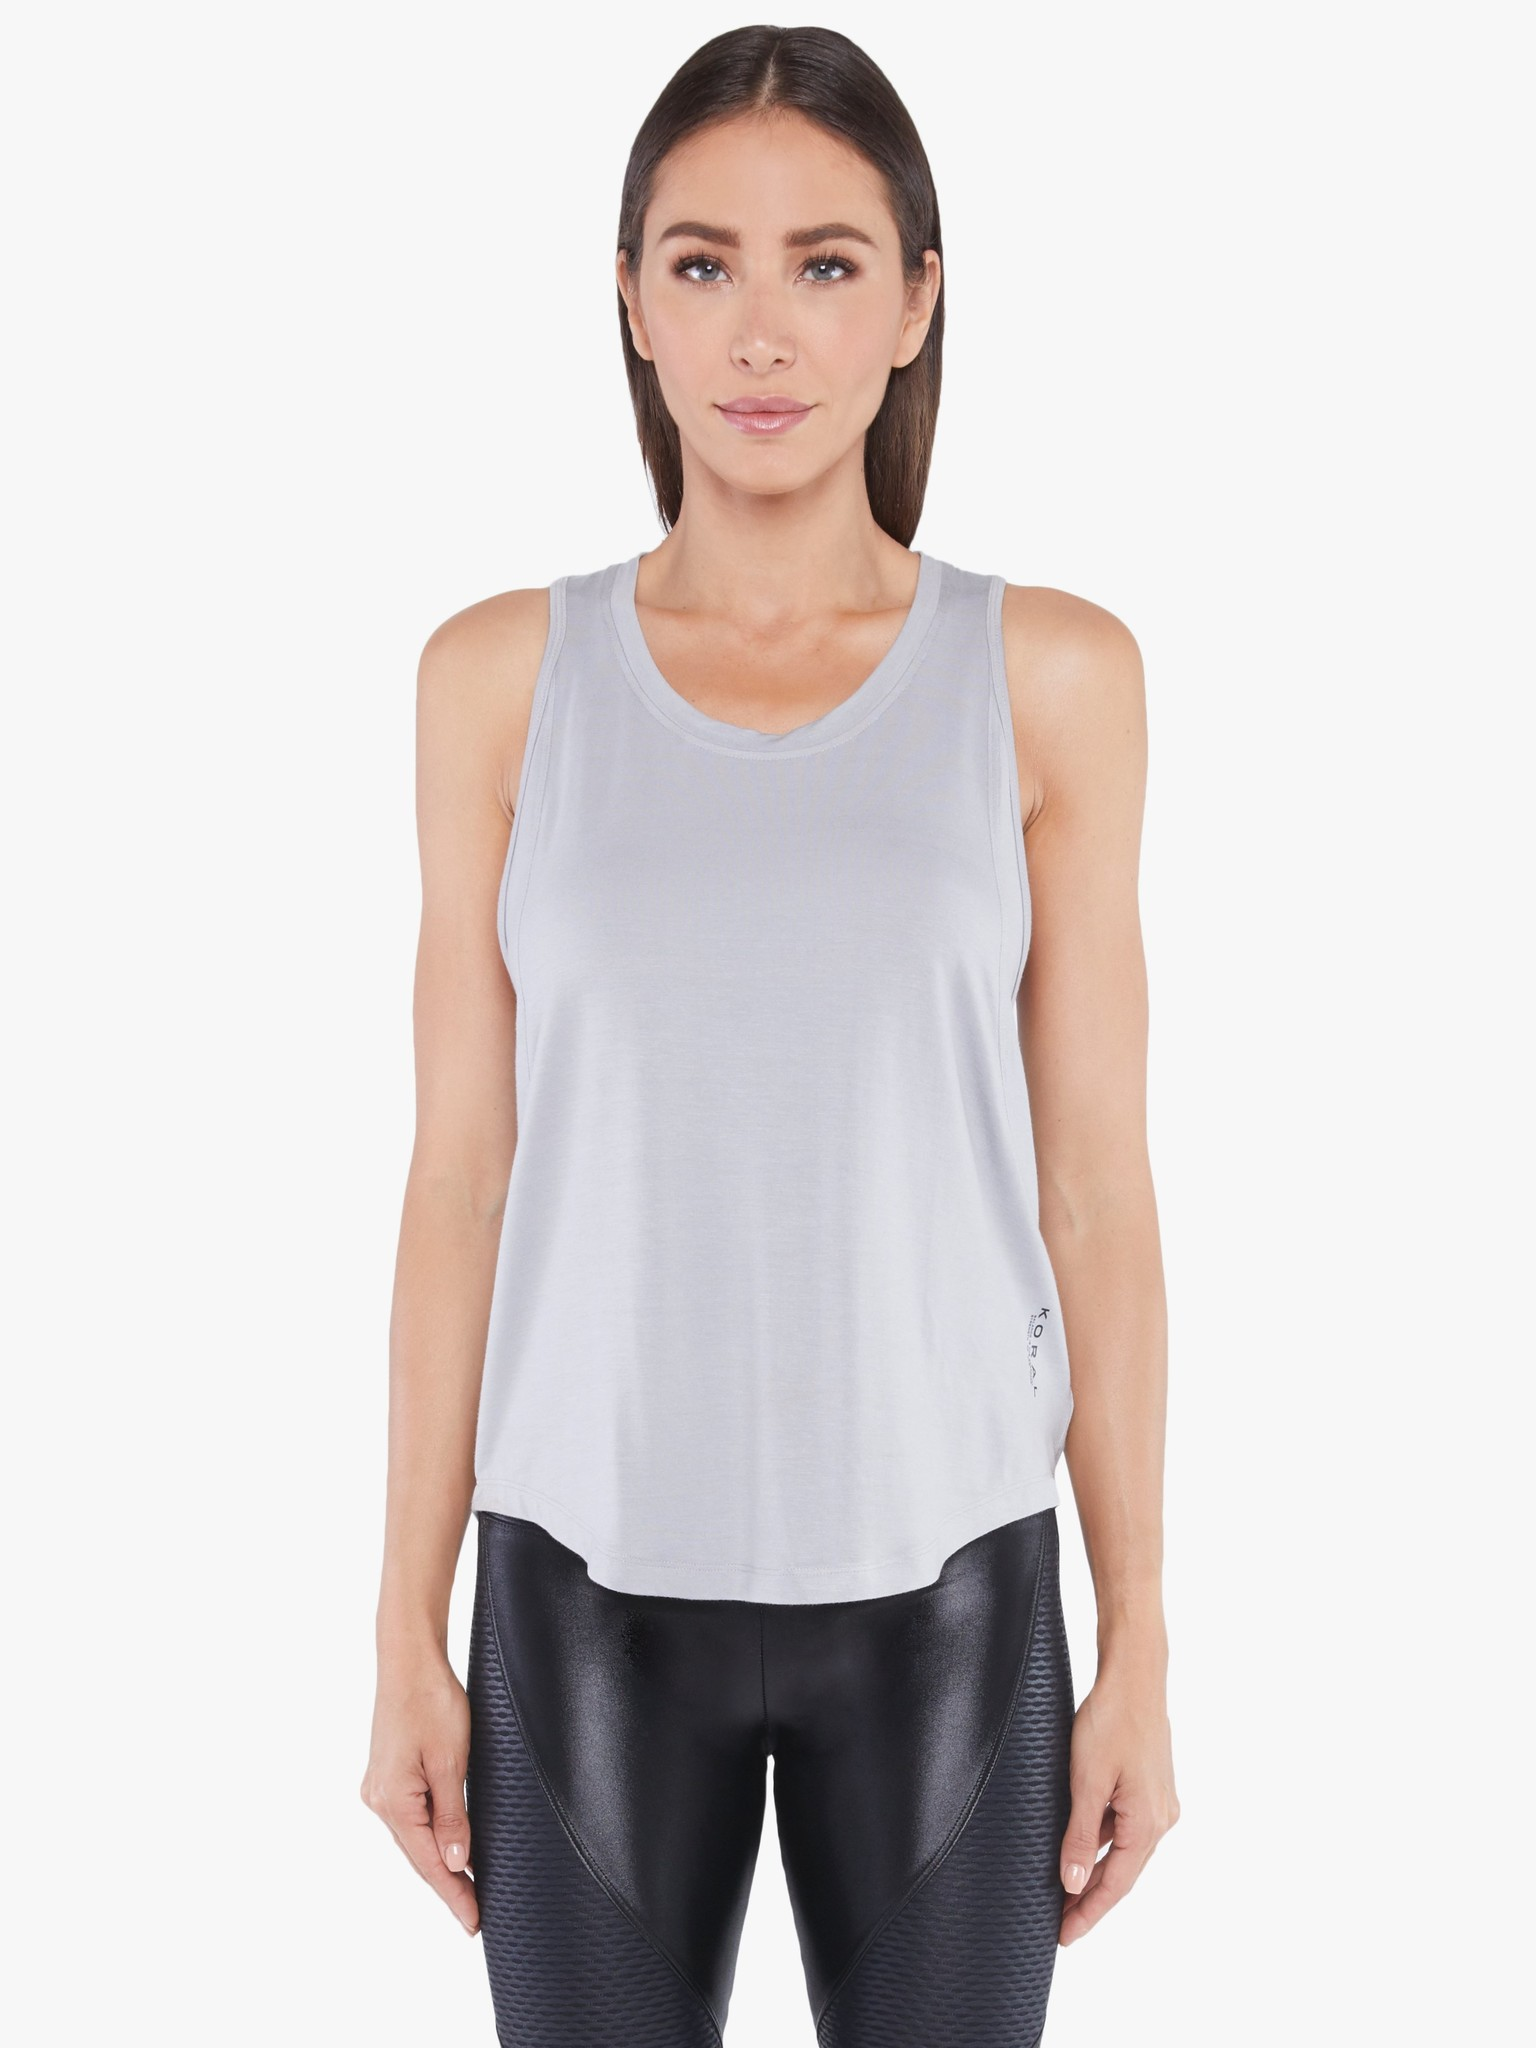 Koral Activewear Adriana Bamboo Tank